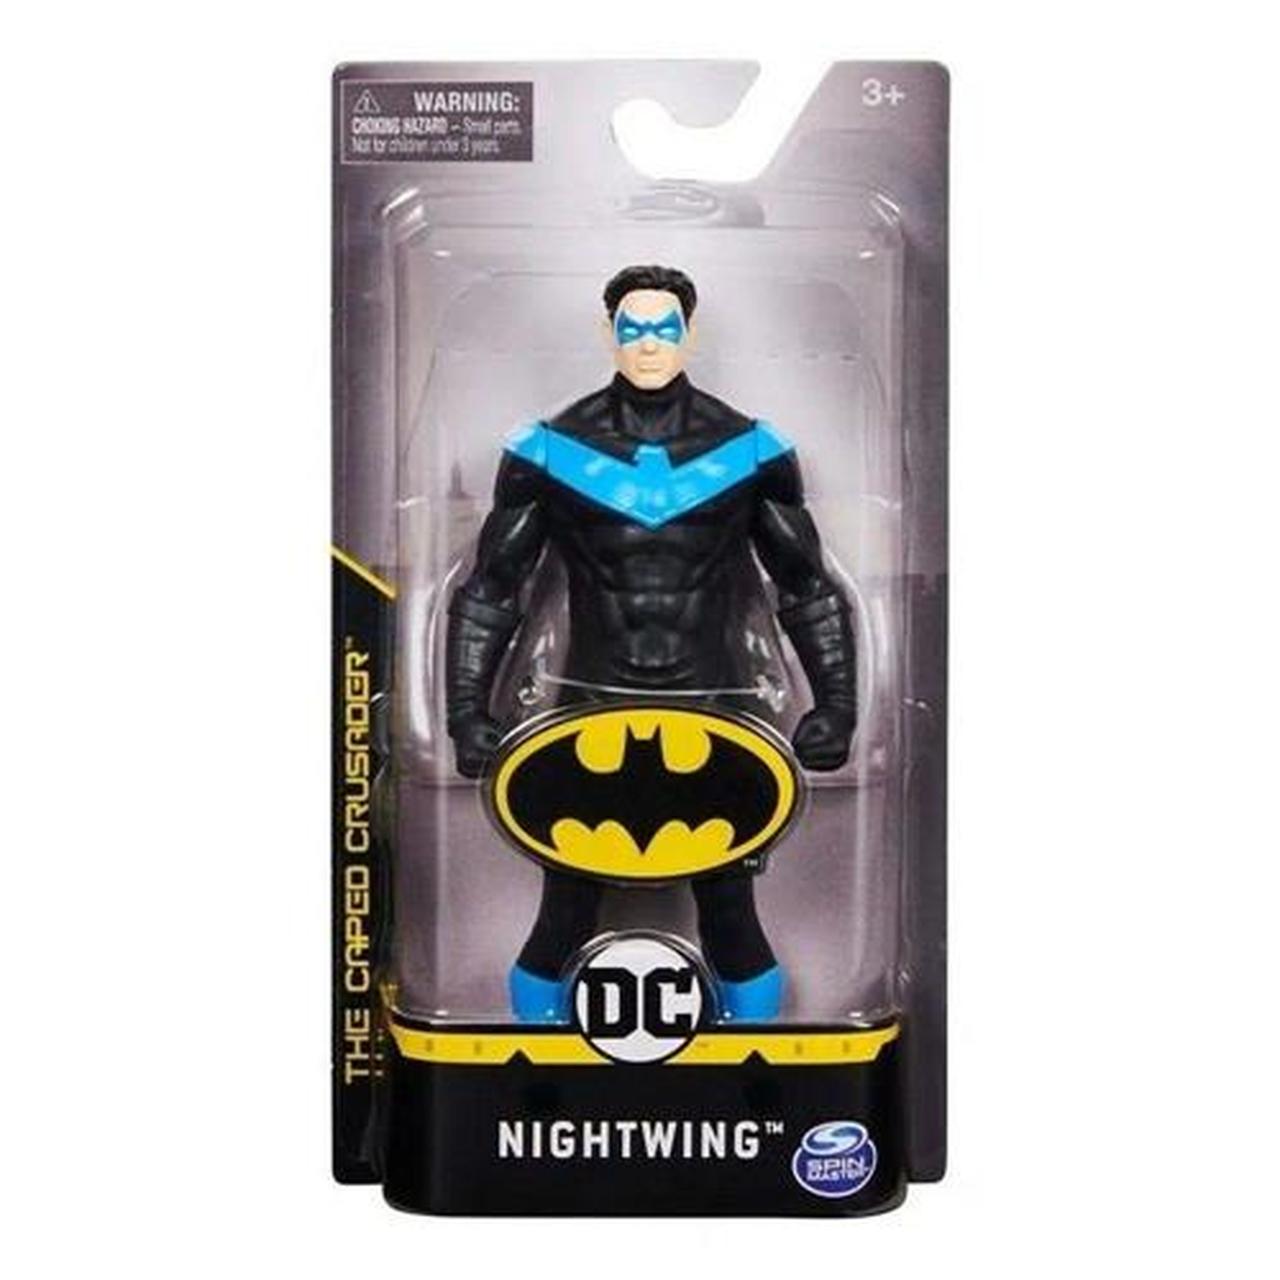 Boneco: Nightwing - DC Comics - Sunny